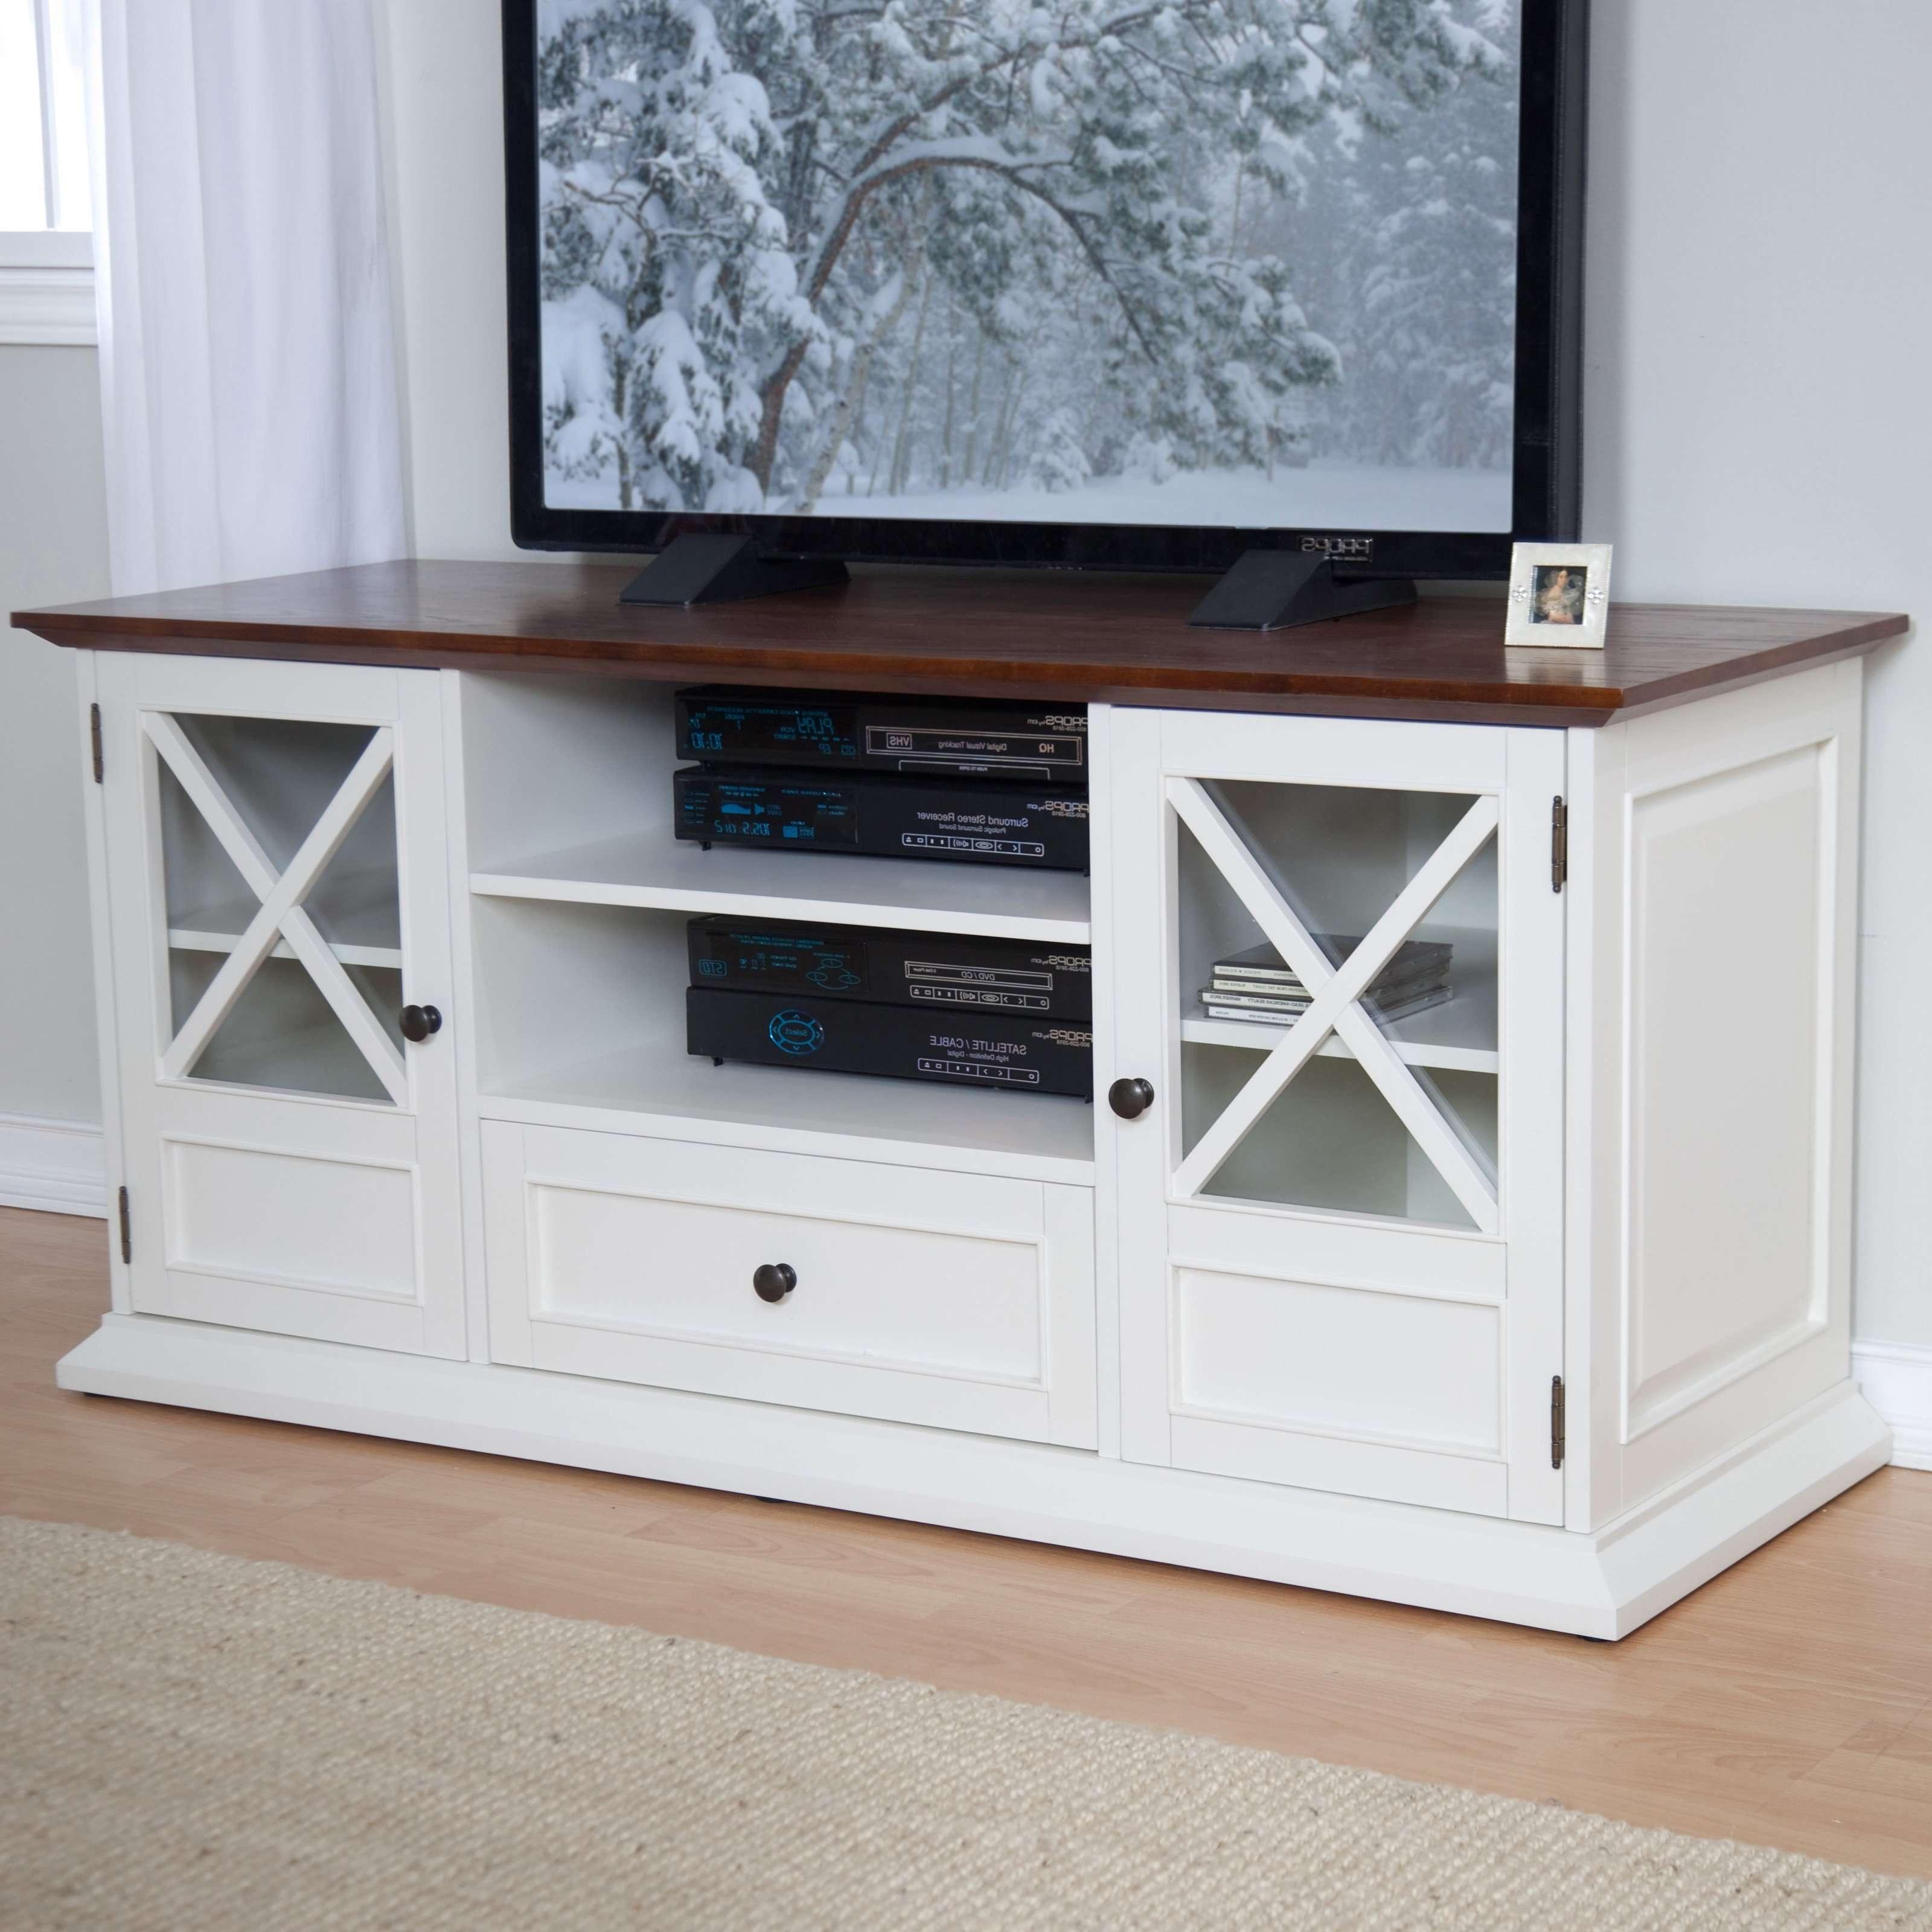 Belham Living Hampton Tv Stand – White/oak | Hayneedle For Oak Tv Stands Furniture (View 6 of 15)